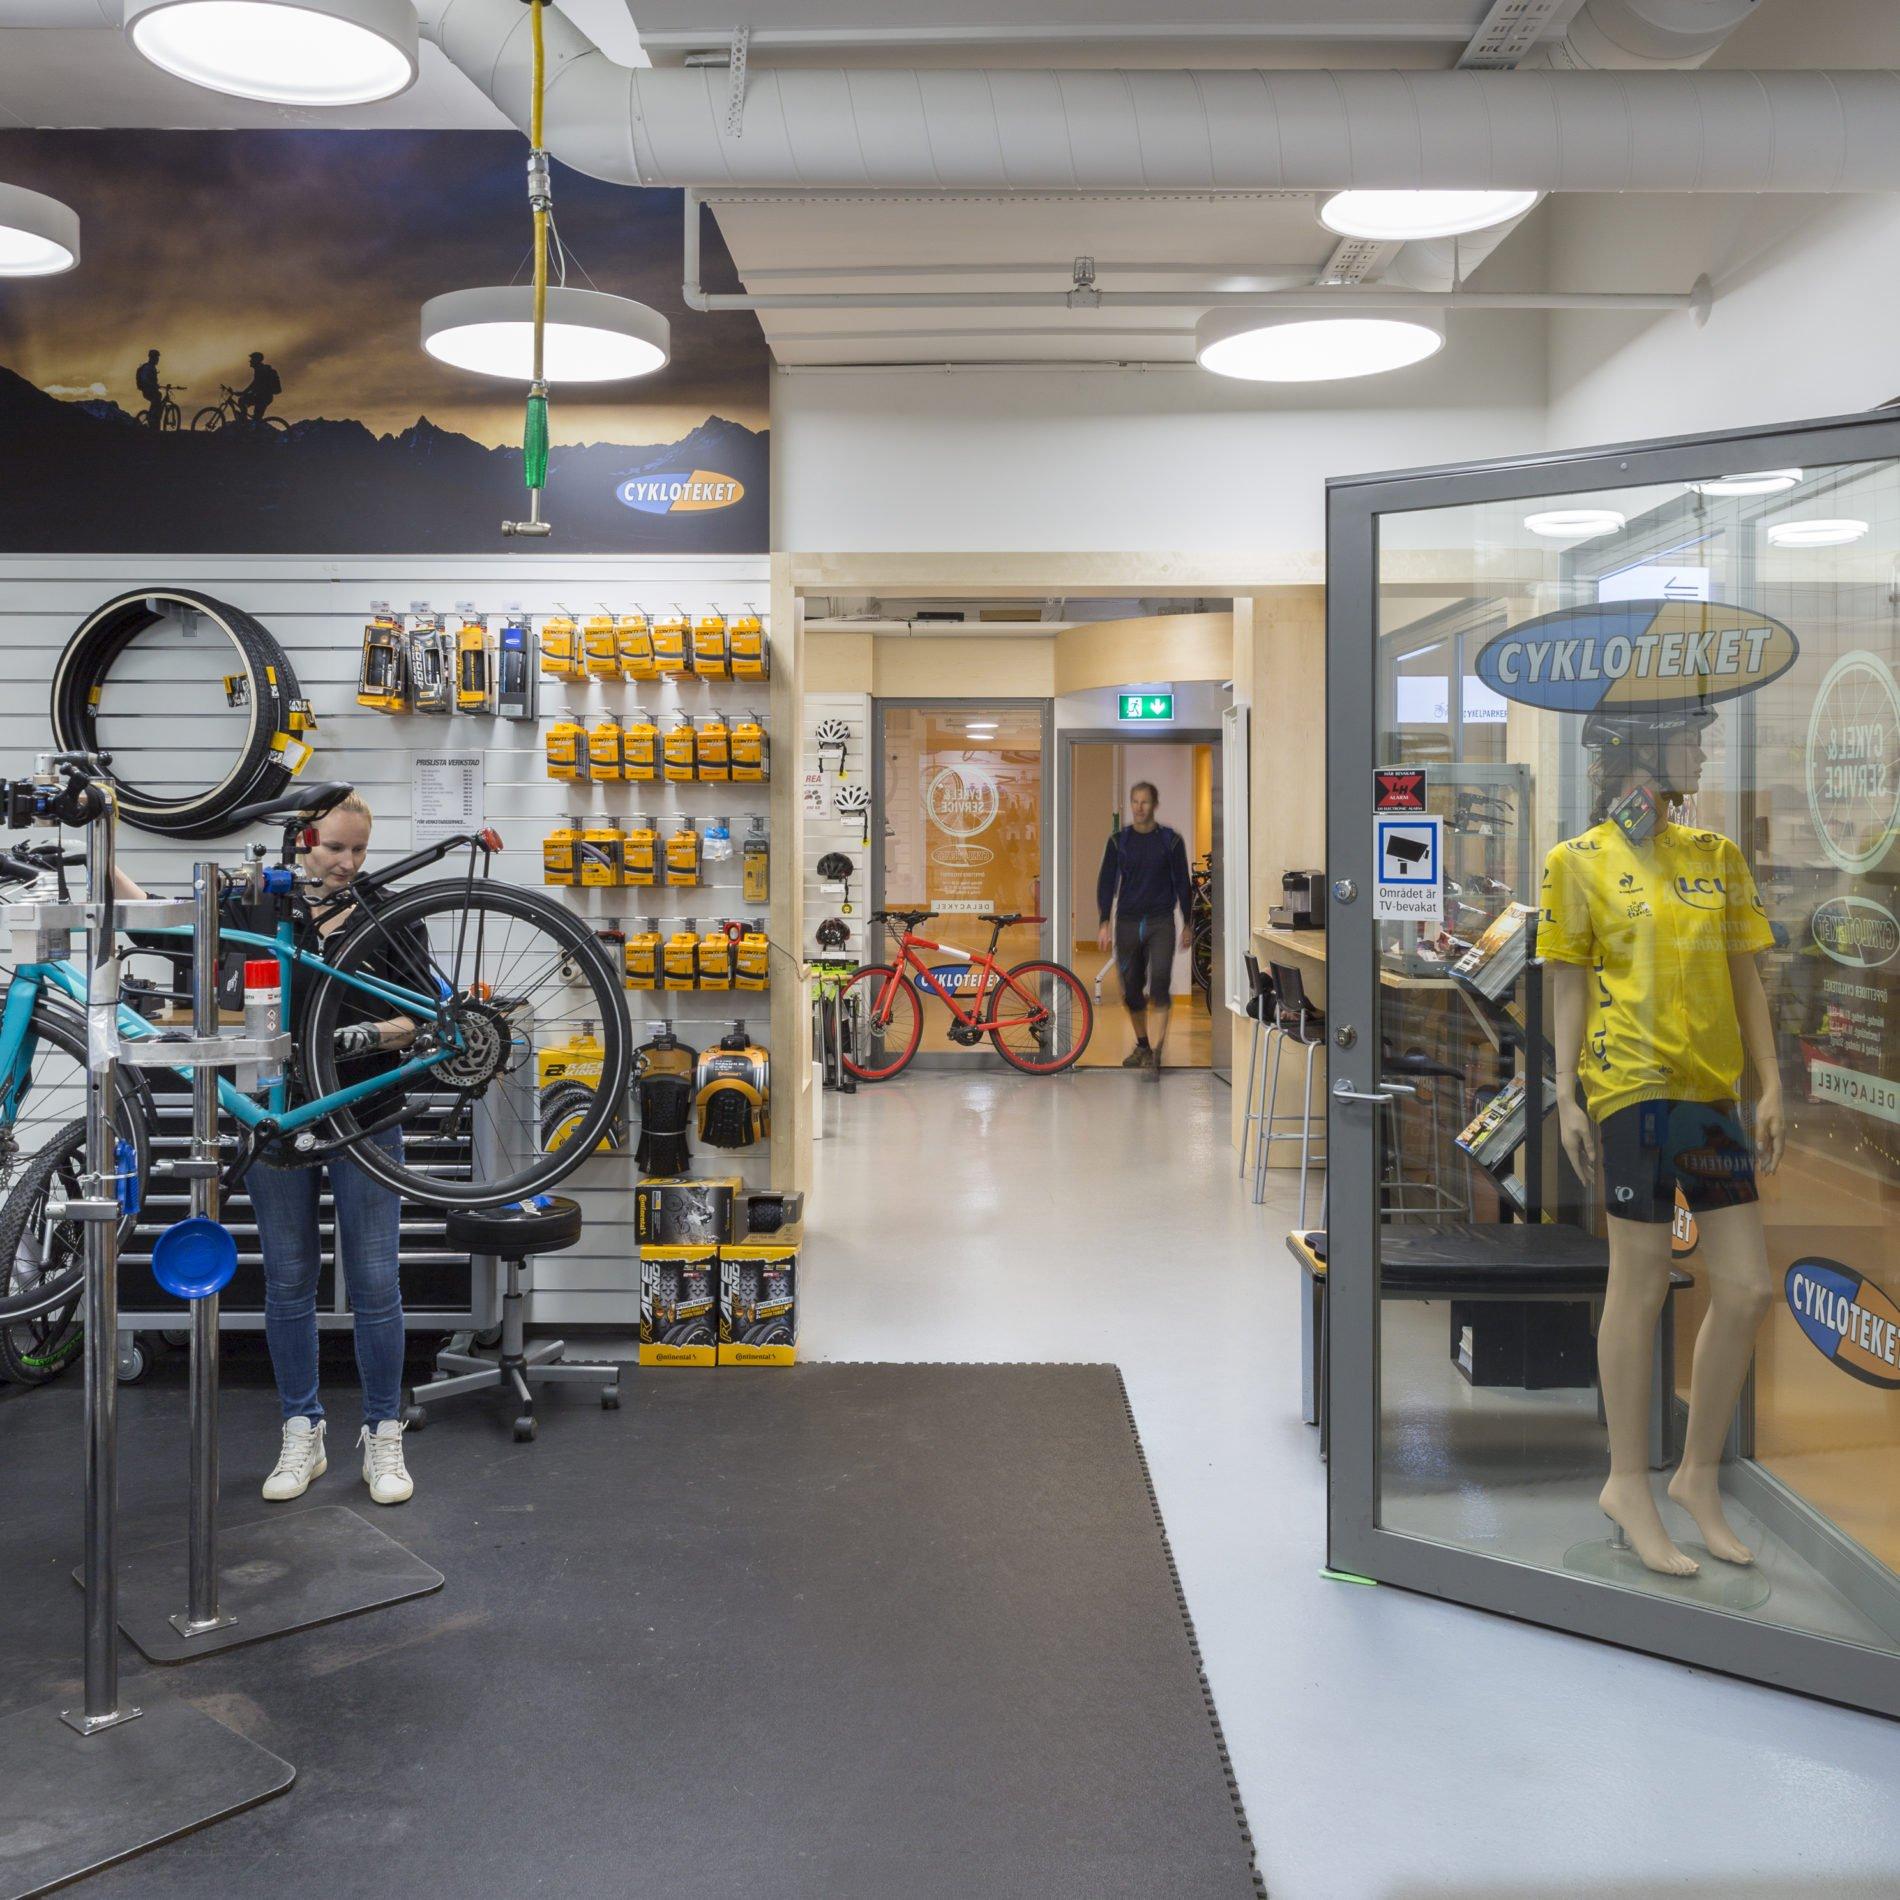 Cykloteket Cykel & service Klara Zenit